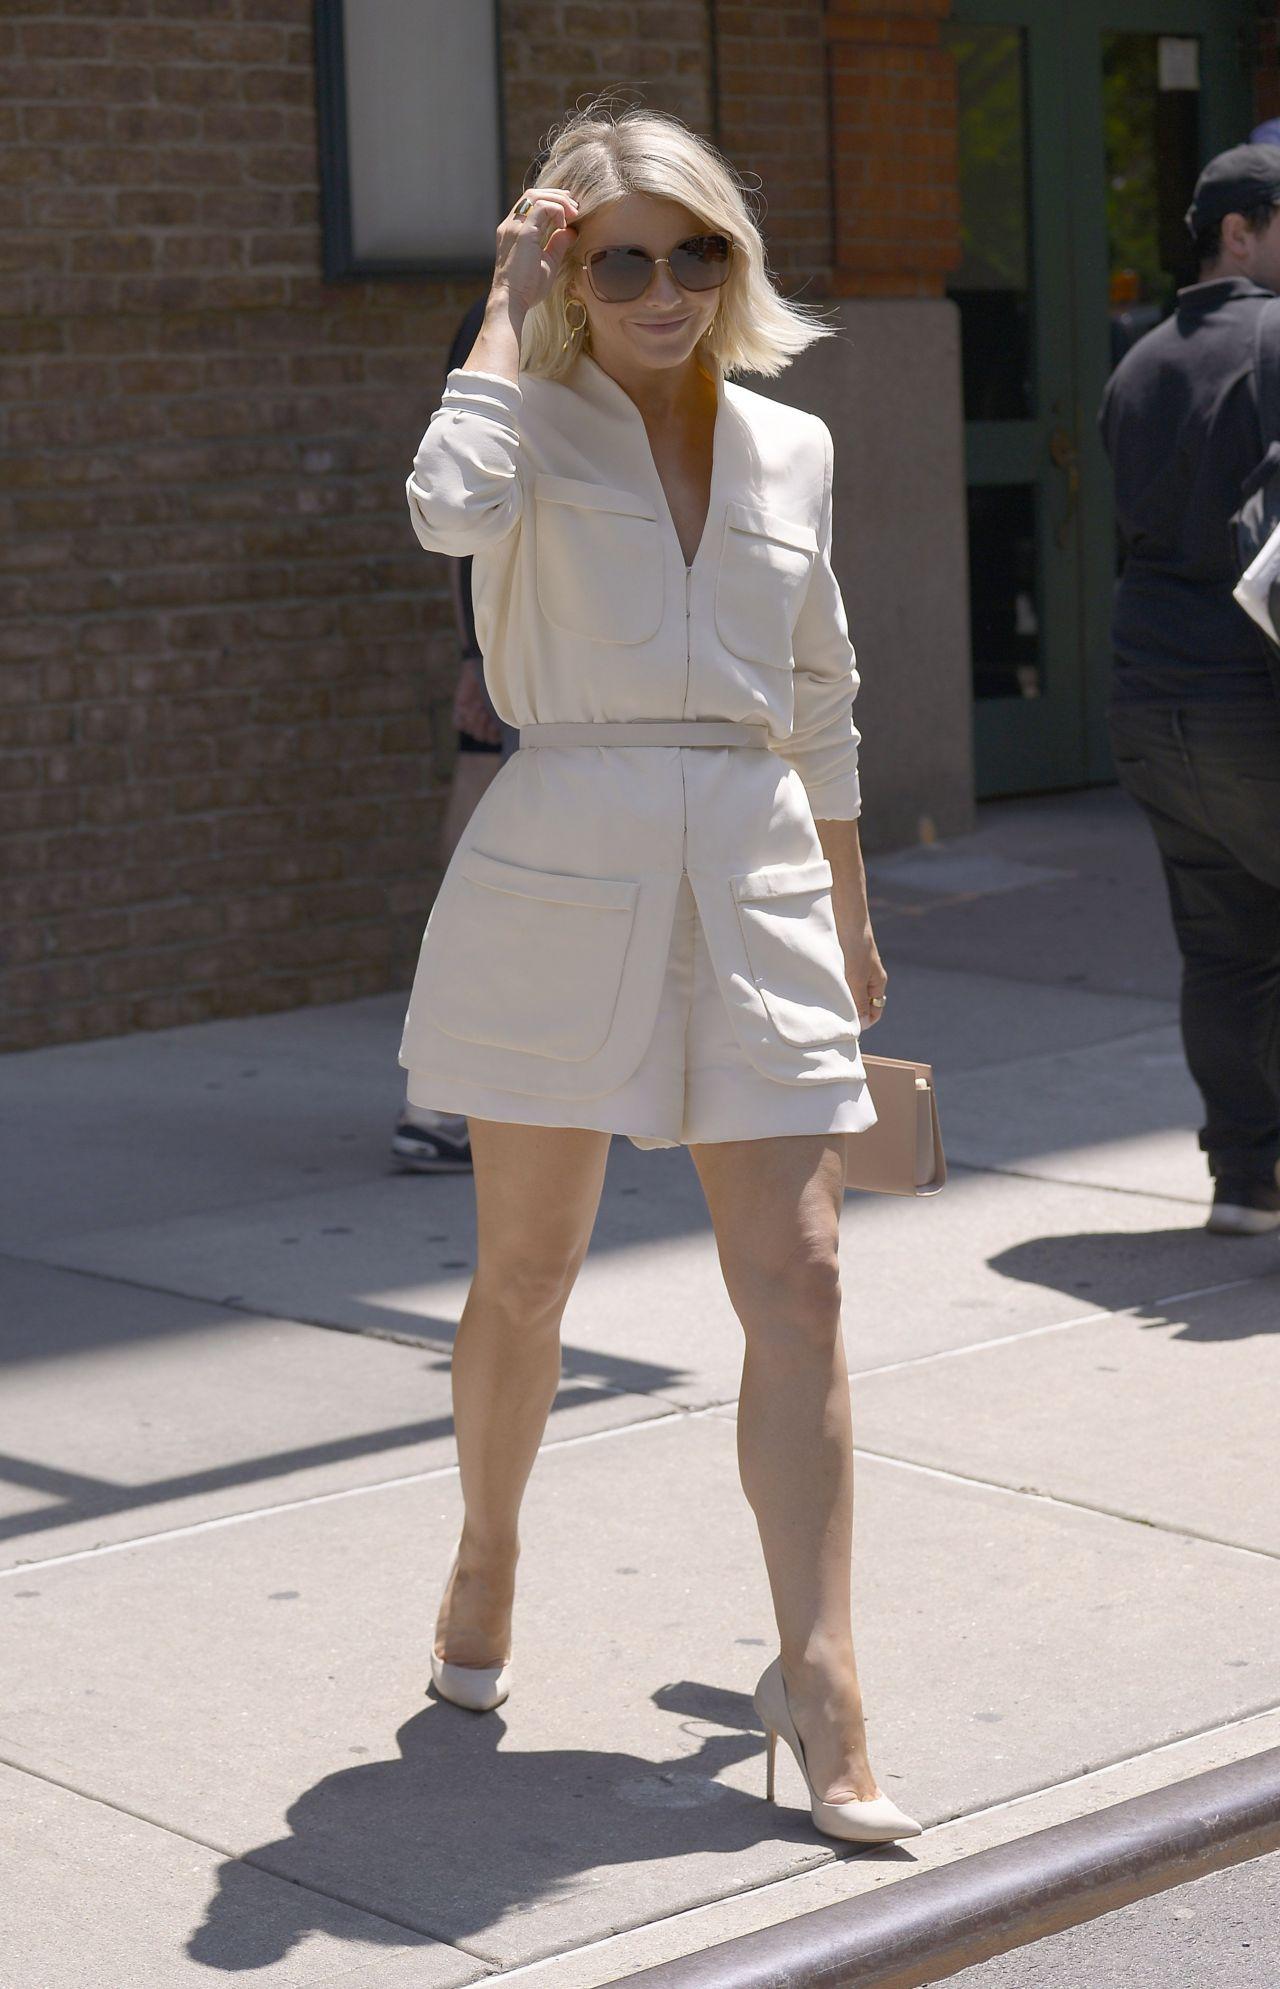 Julianne Hough Is Looking All Stylish 06 23 2019